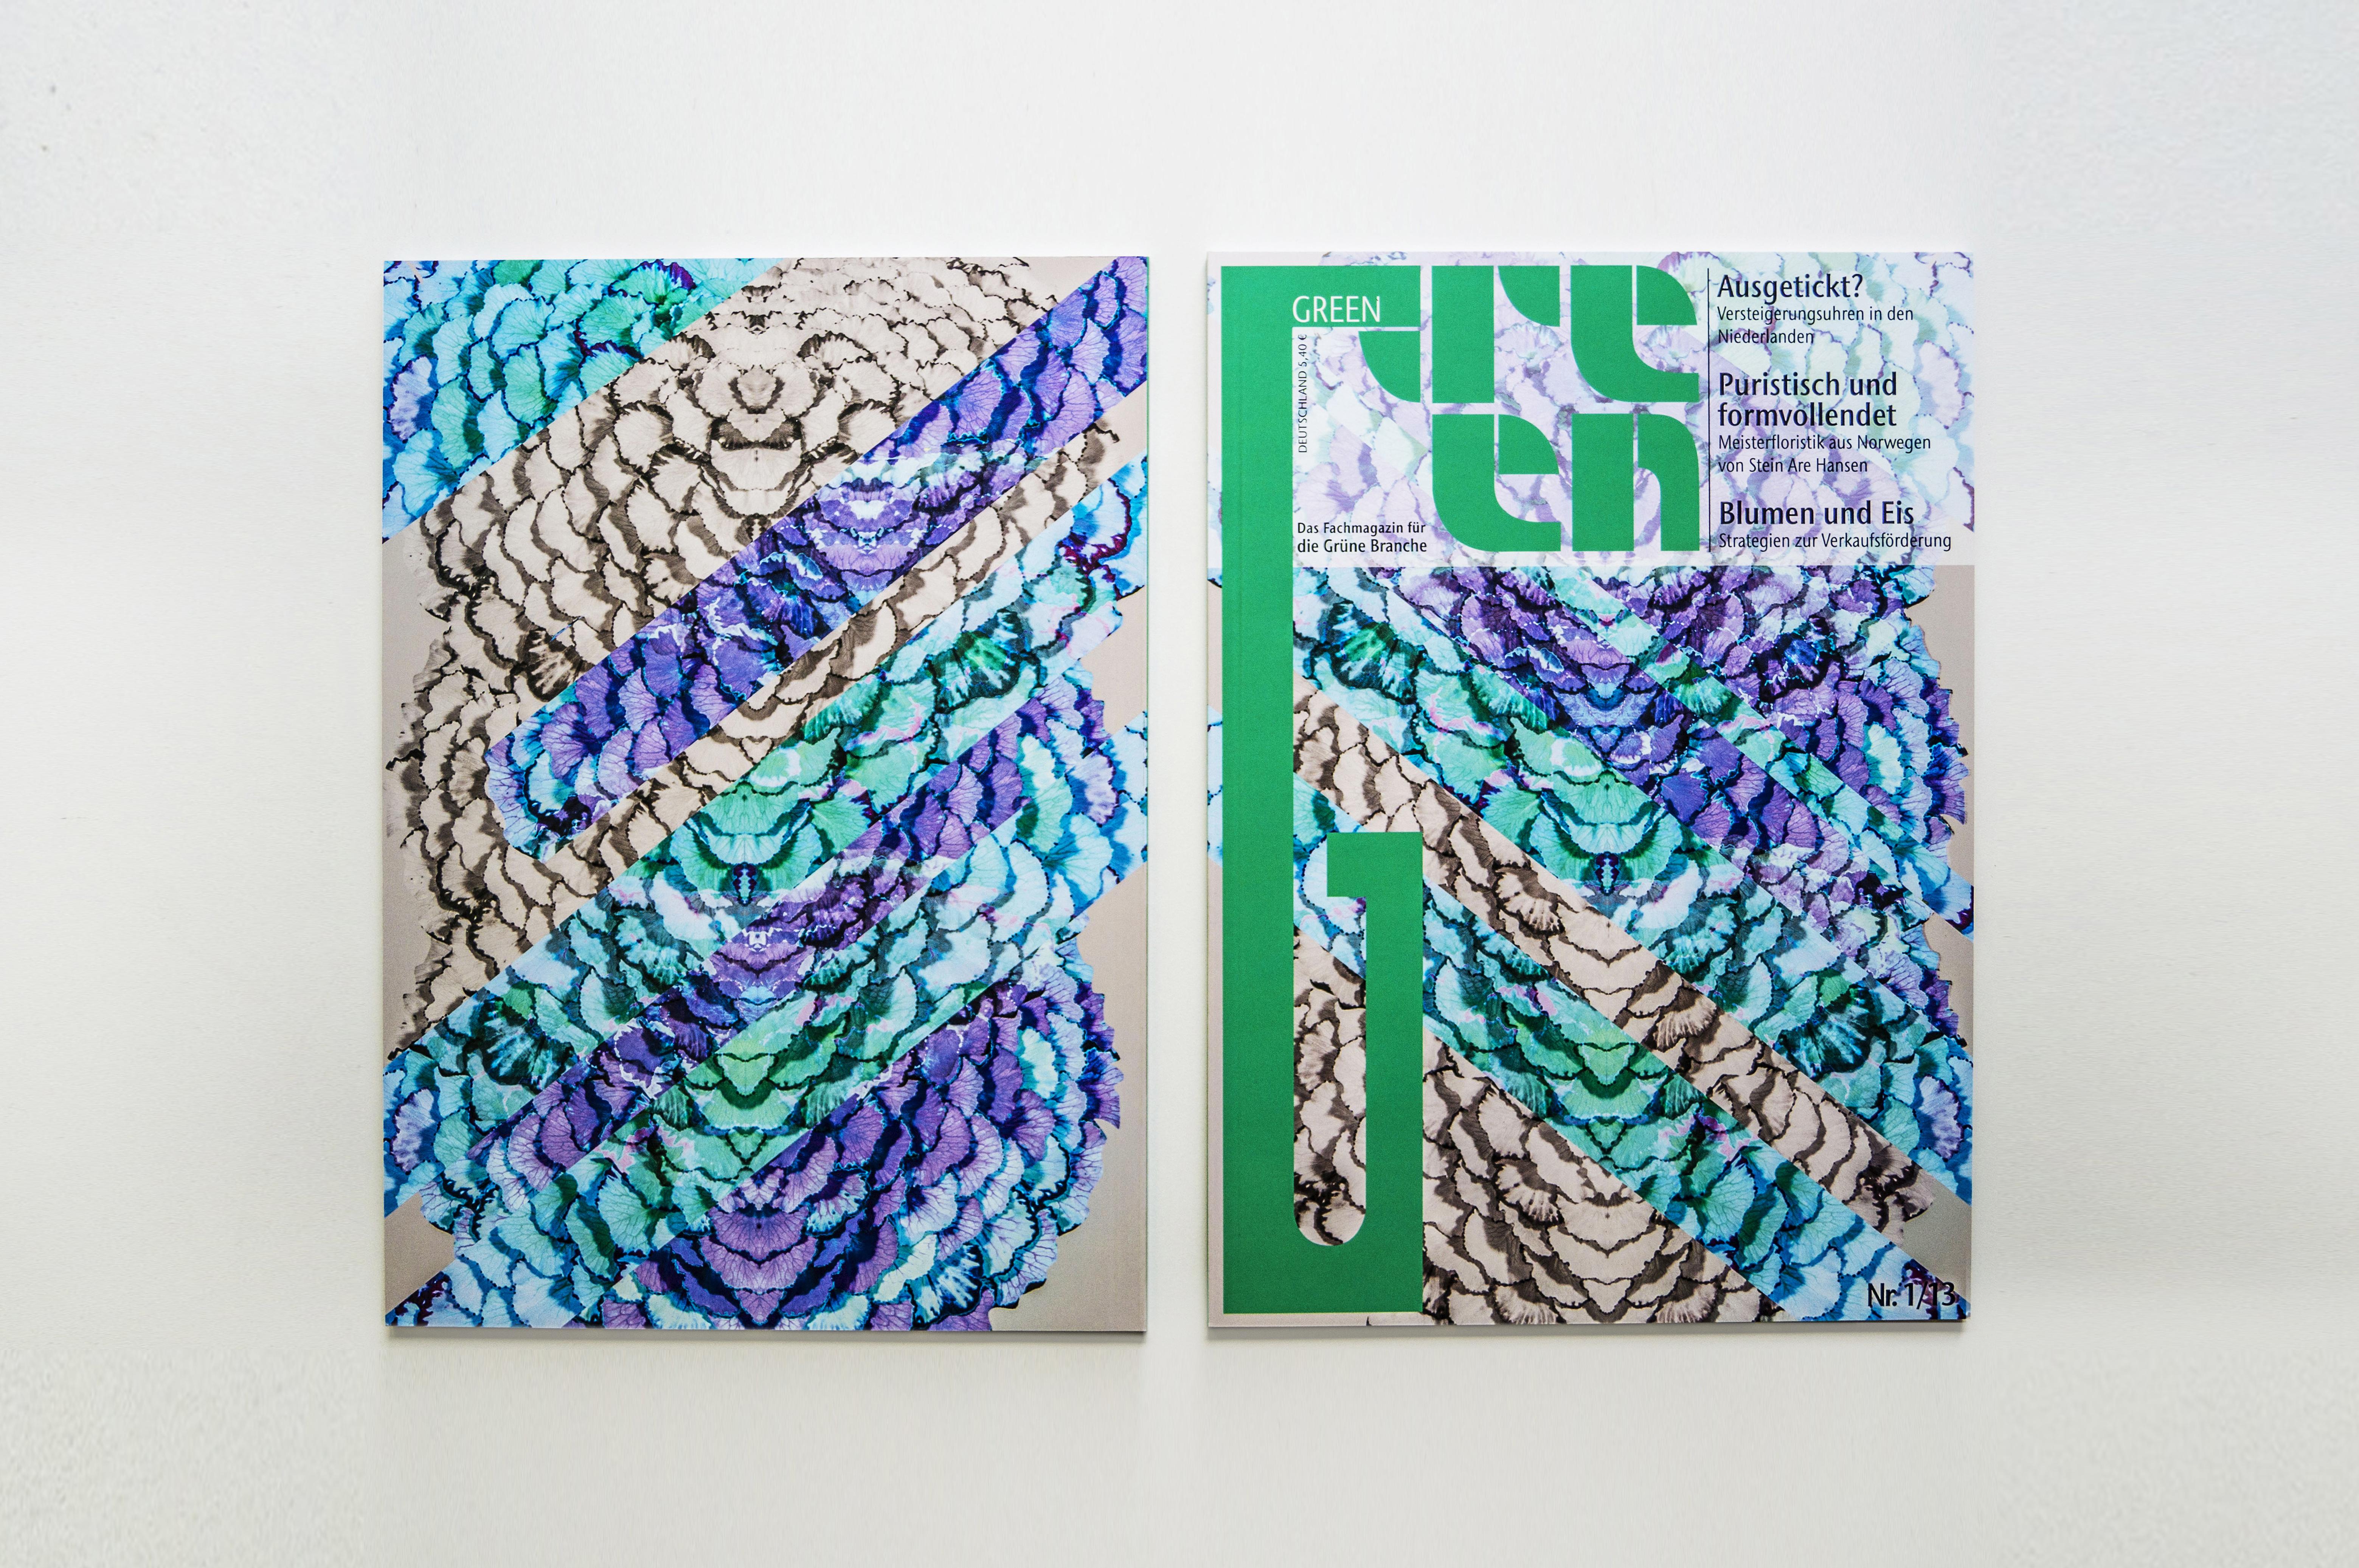 Green Magazin